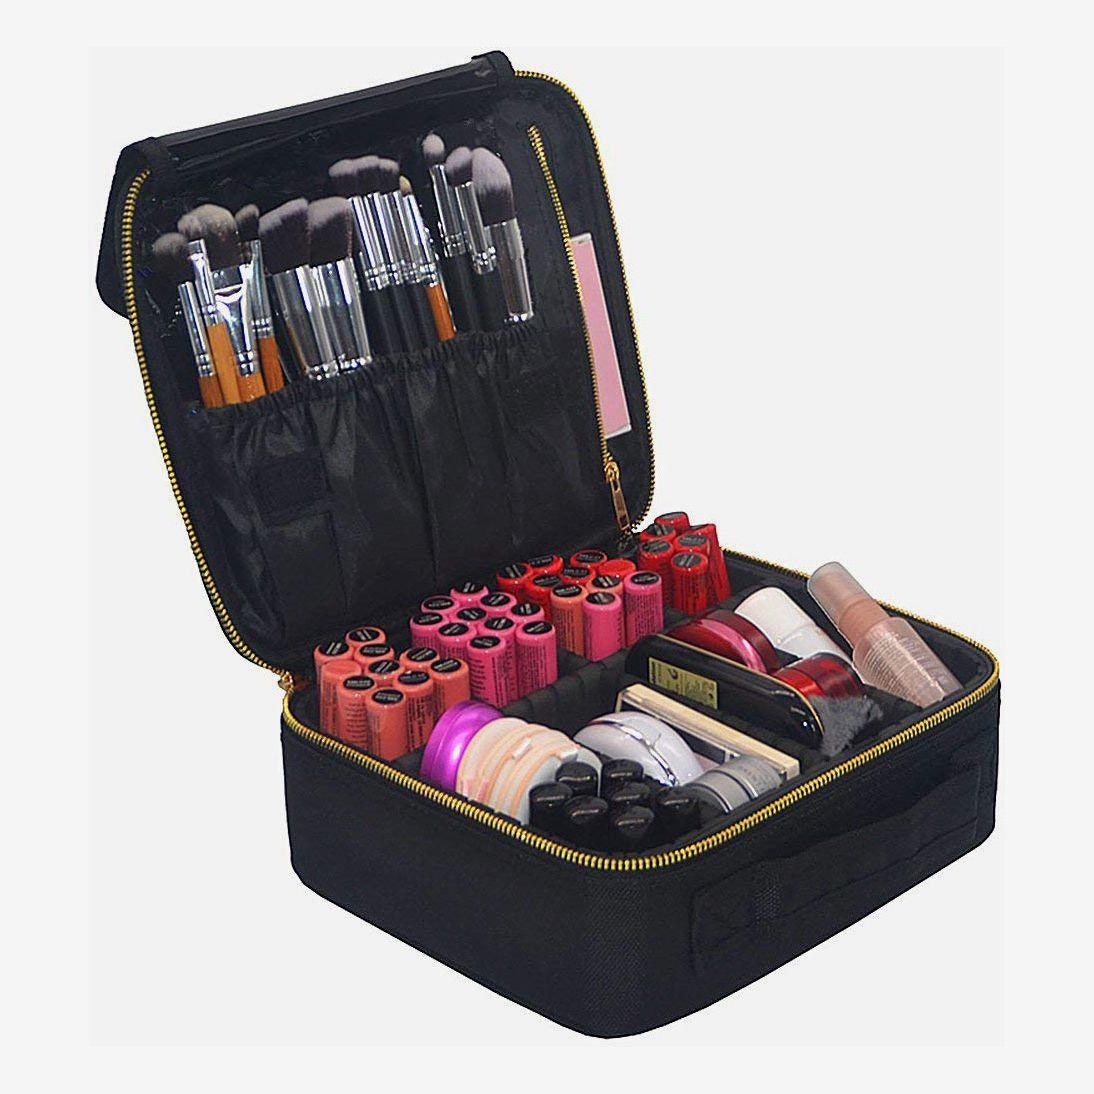 12 Best Makeup Bags According